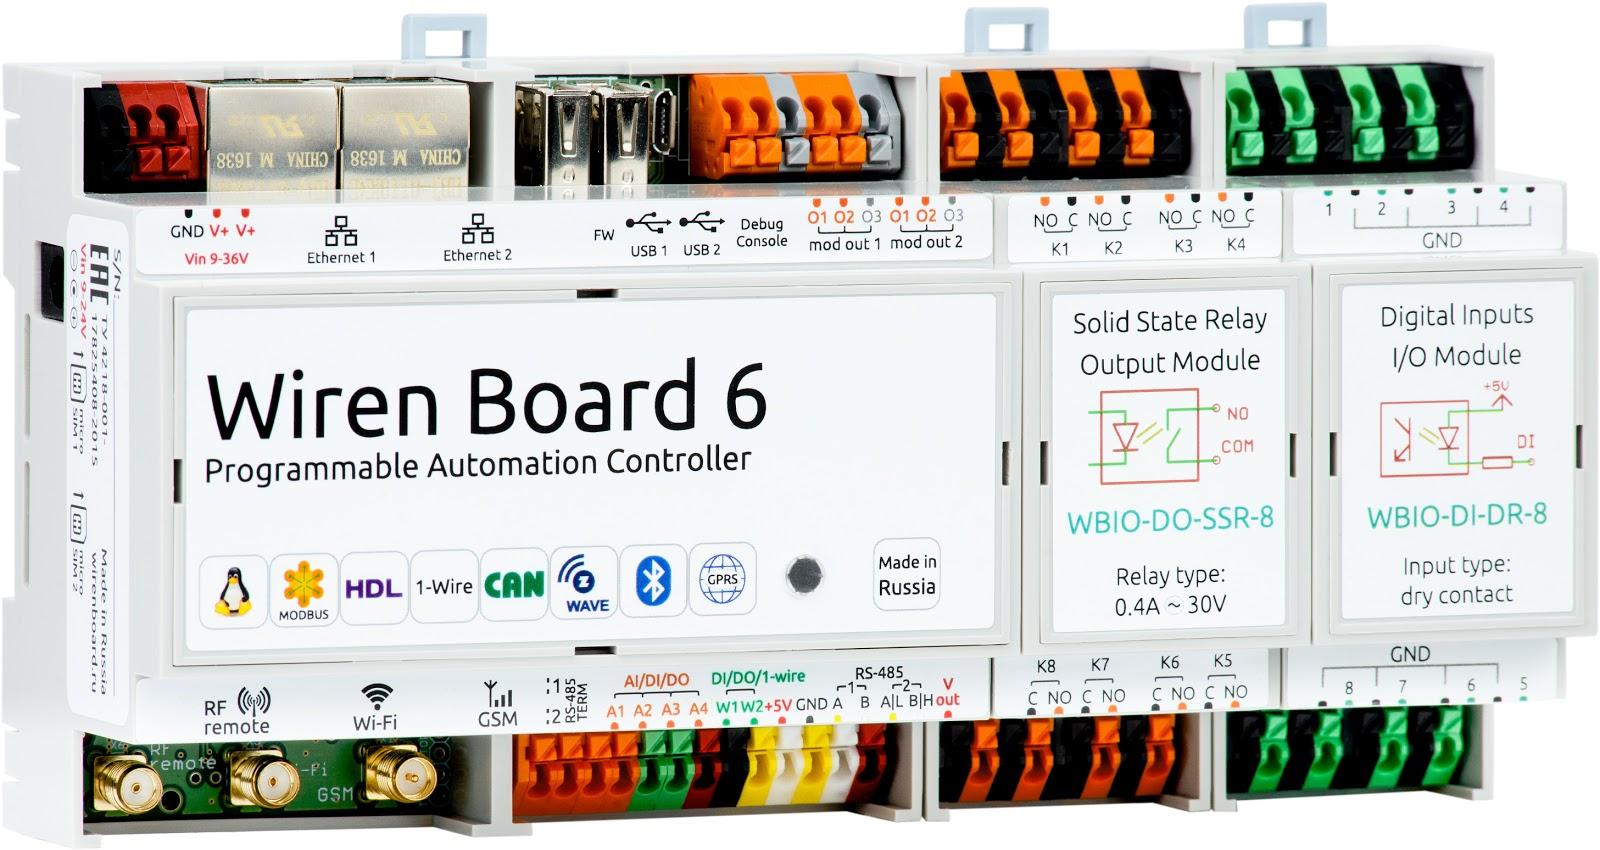 Wiren Board 6: снова на Хабре с новой версией контроллера для автоматизации